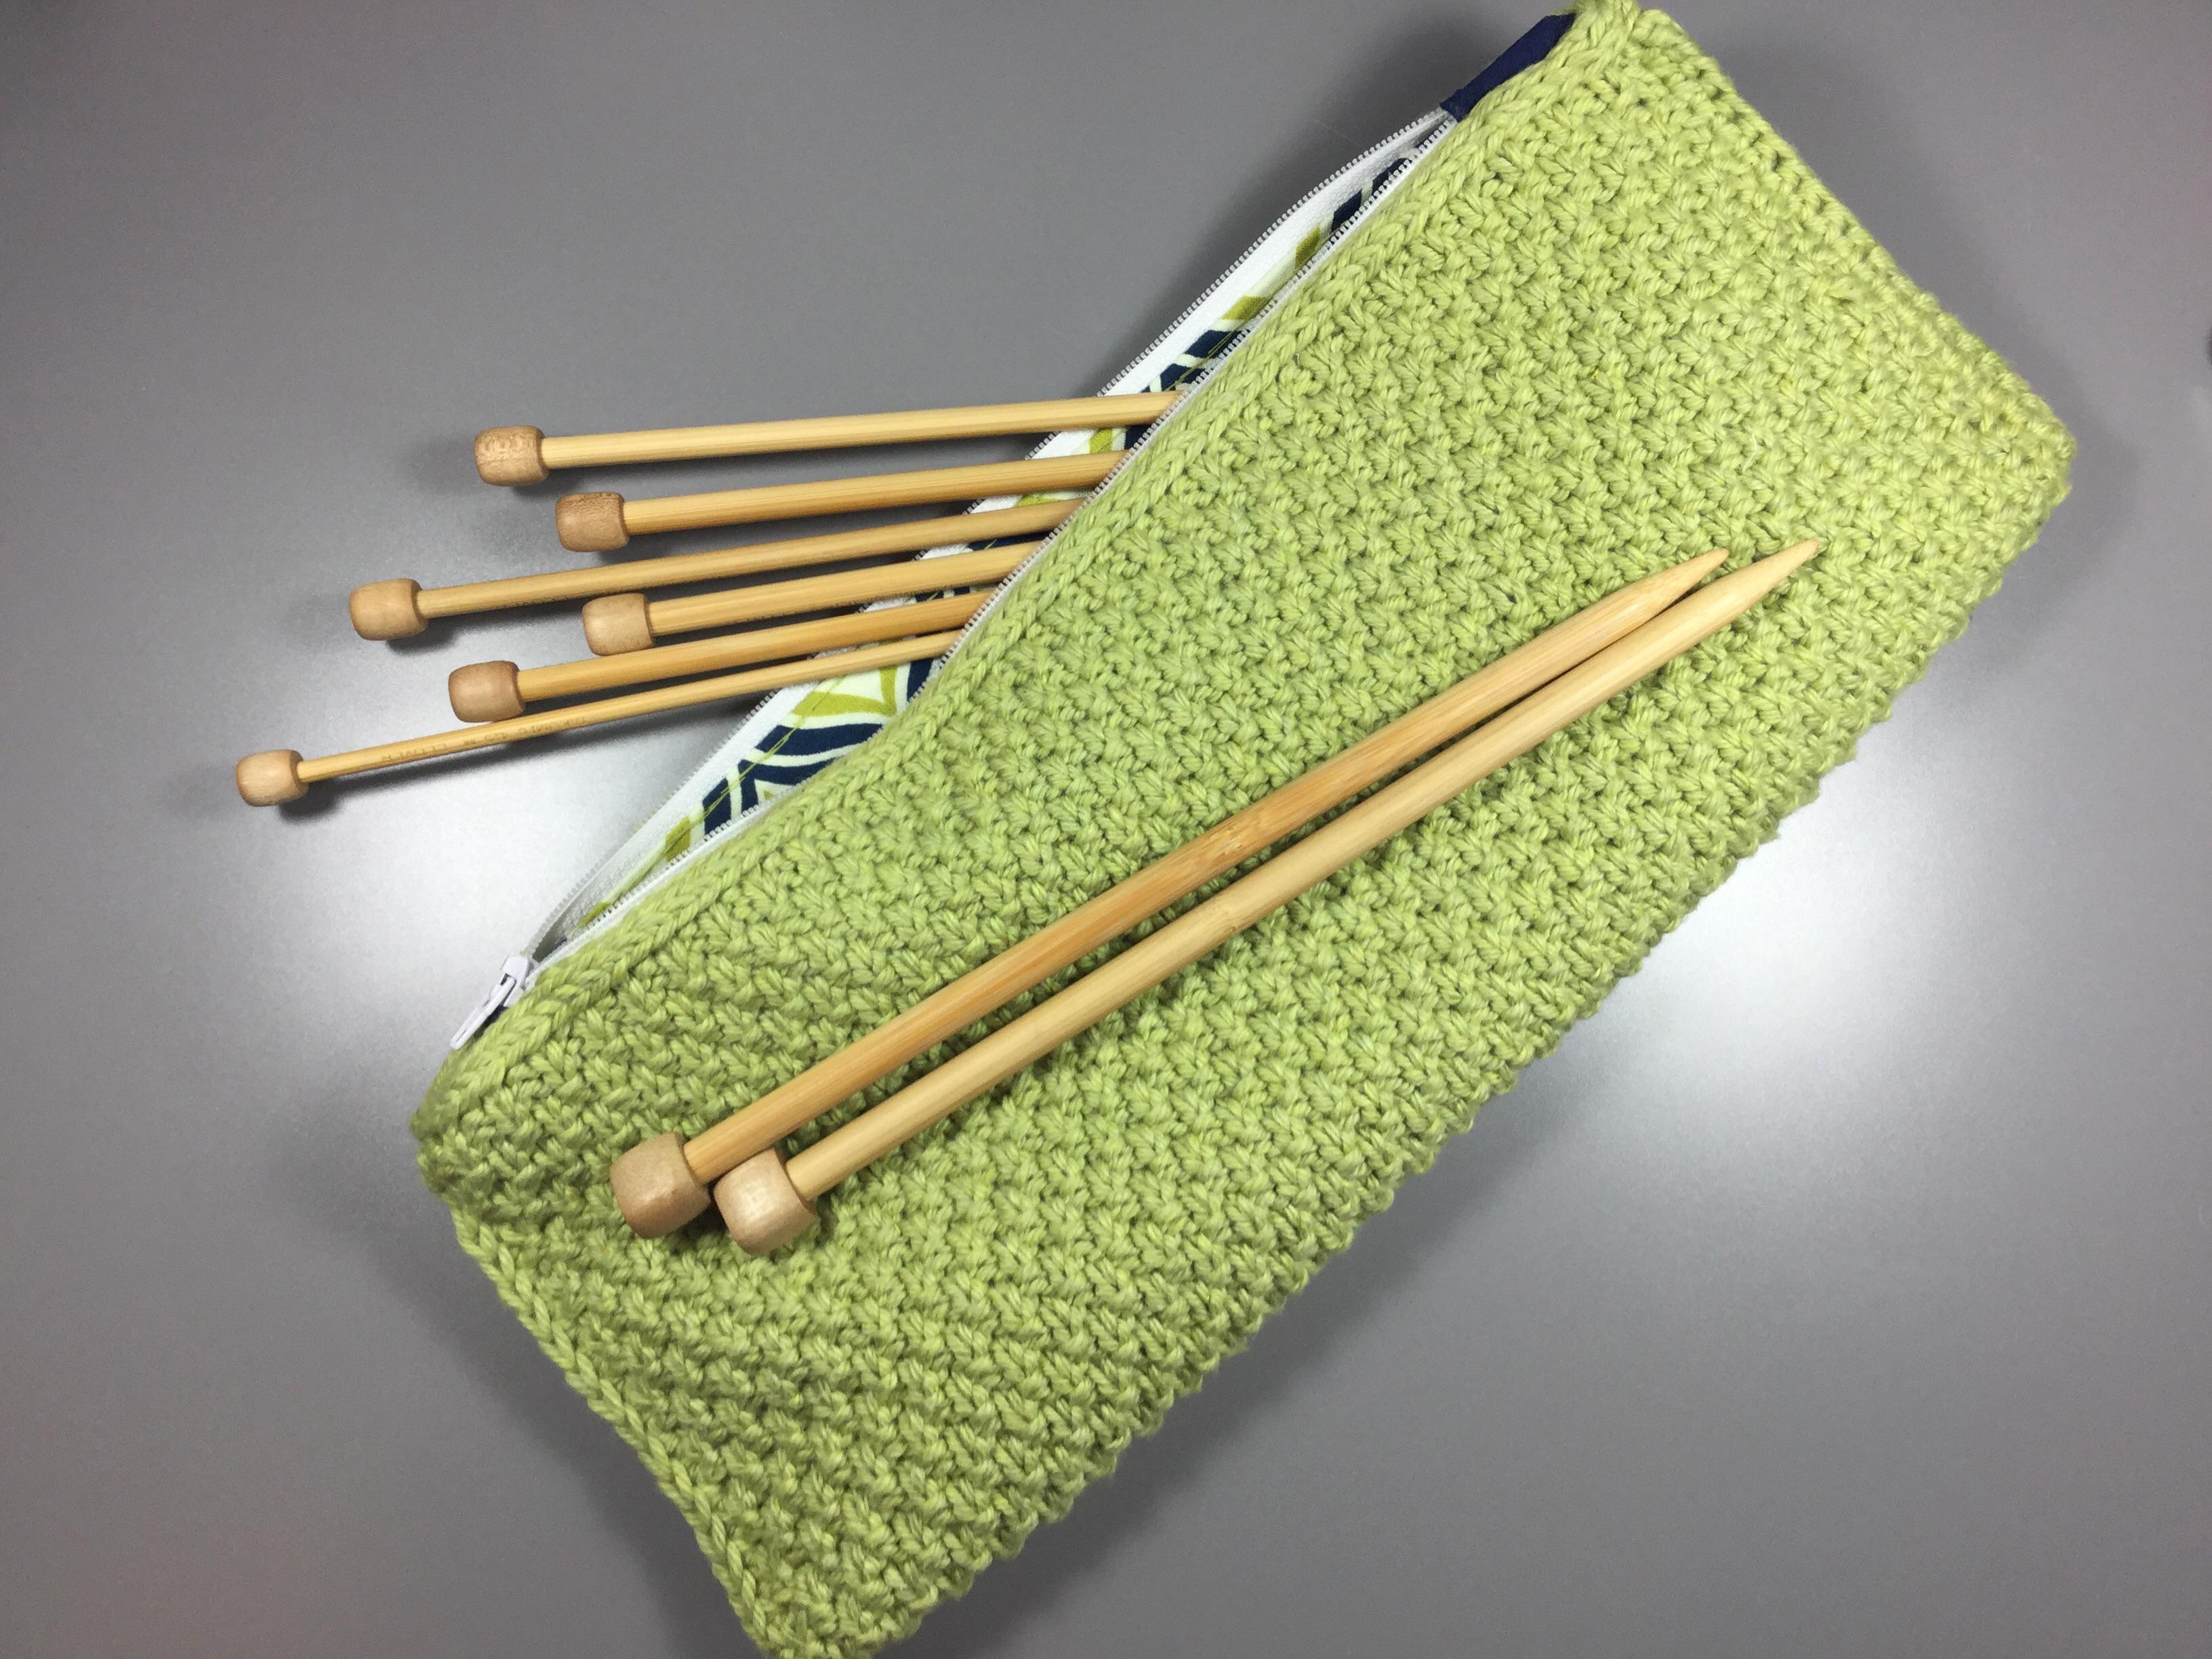 Knitting Zipper Tutorial : Knitting attached i cord tutorial